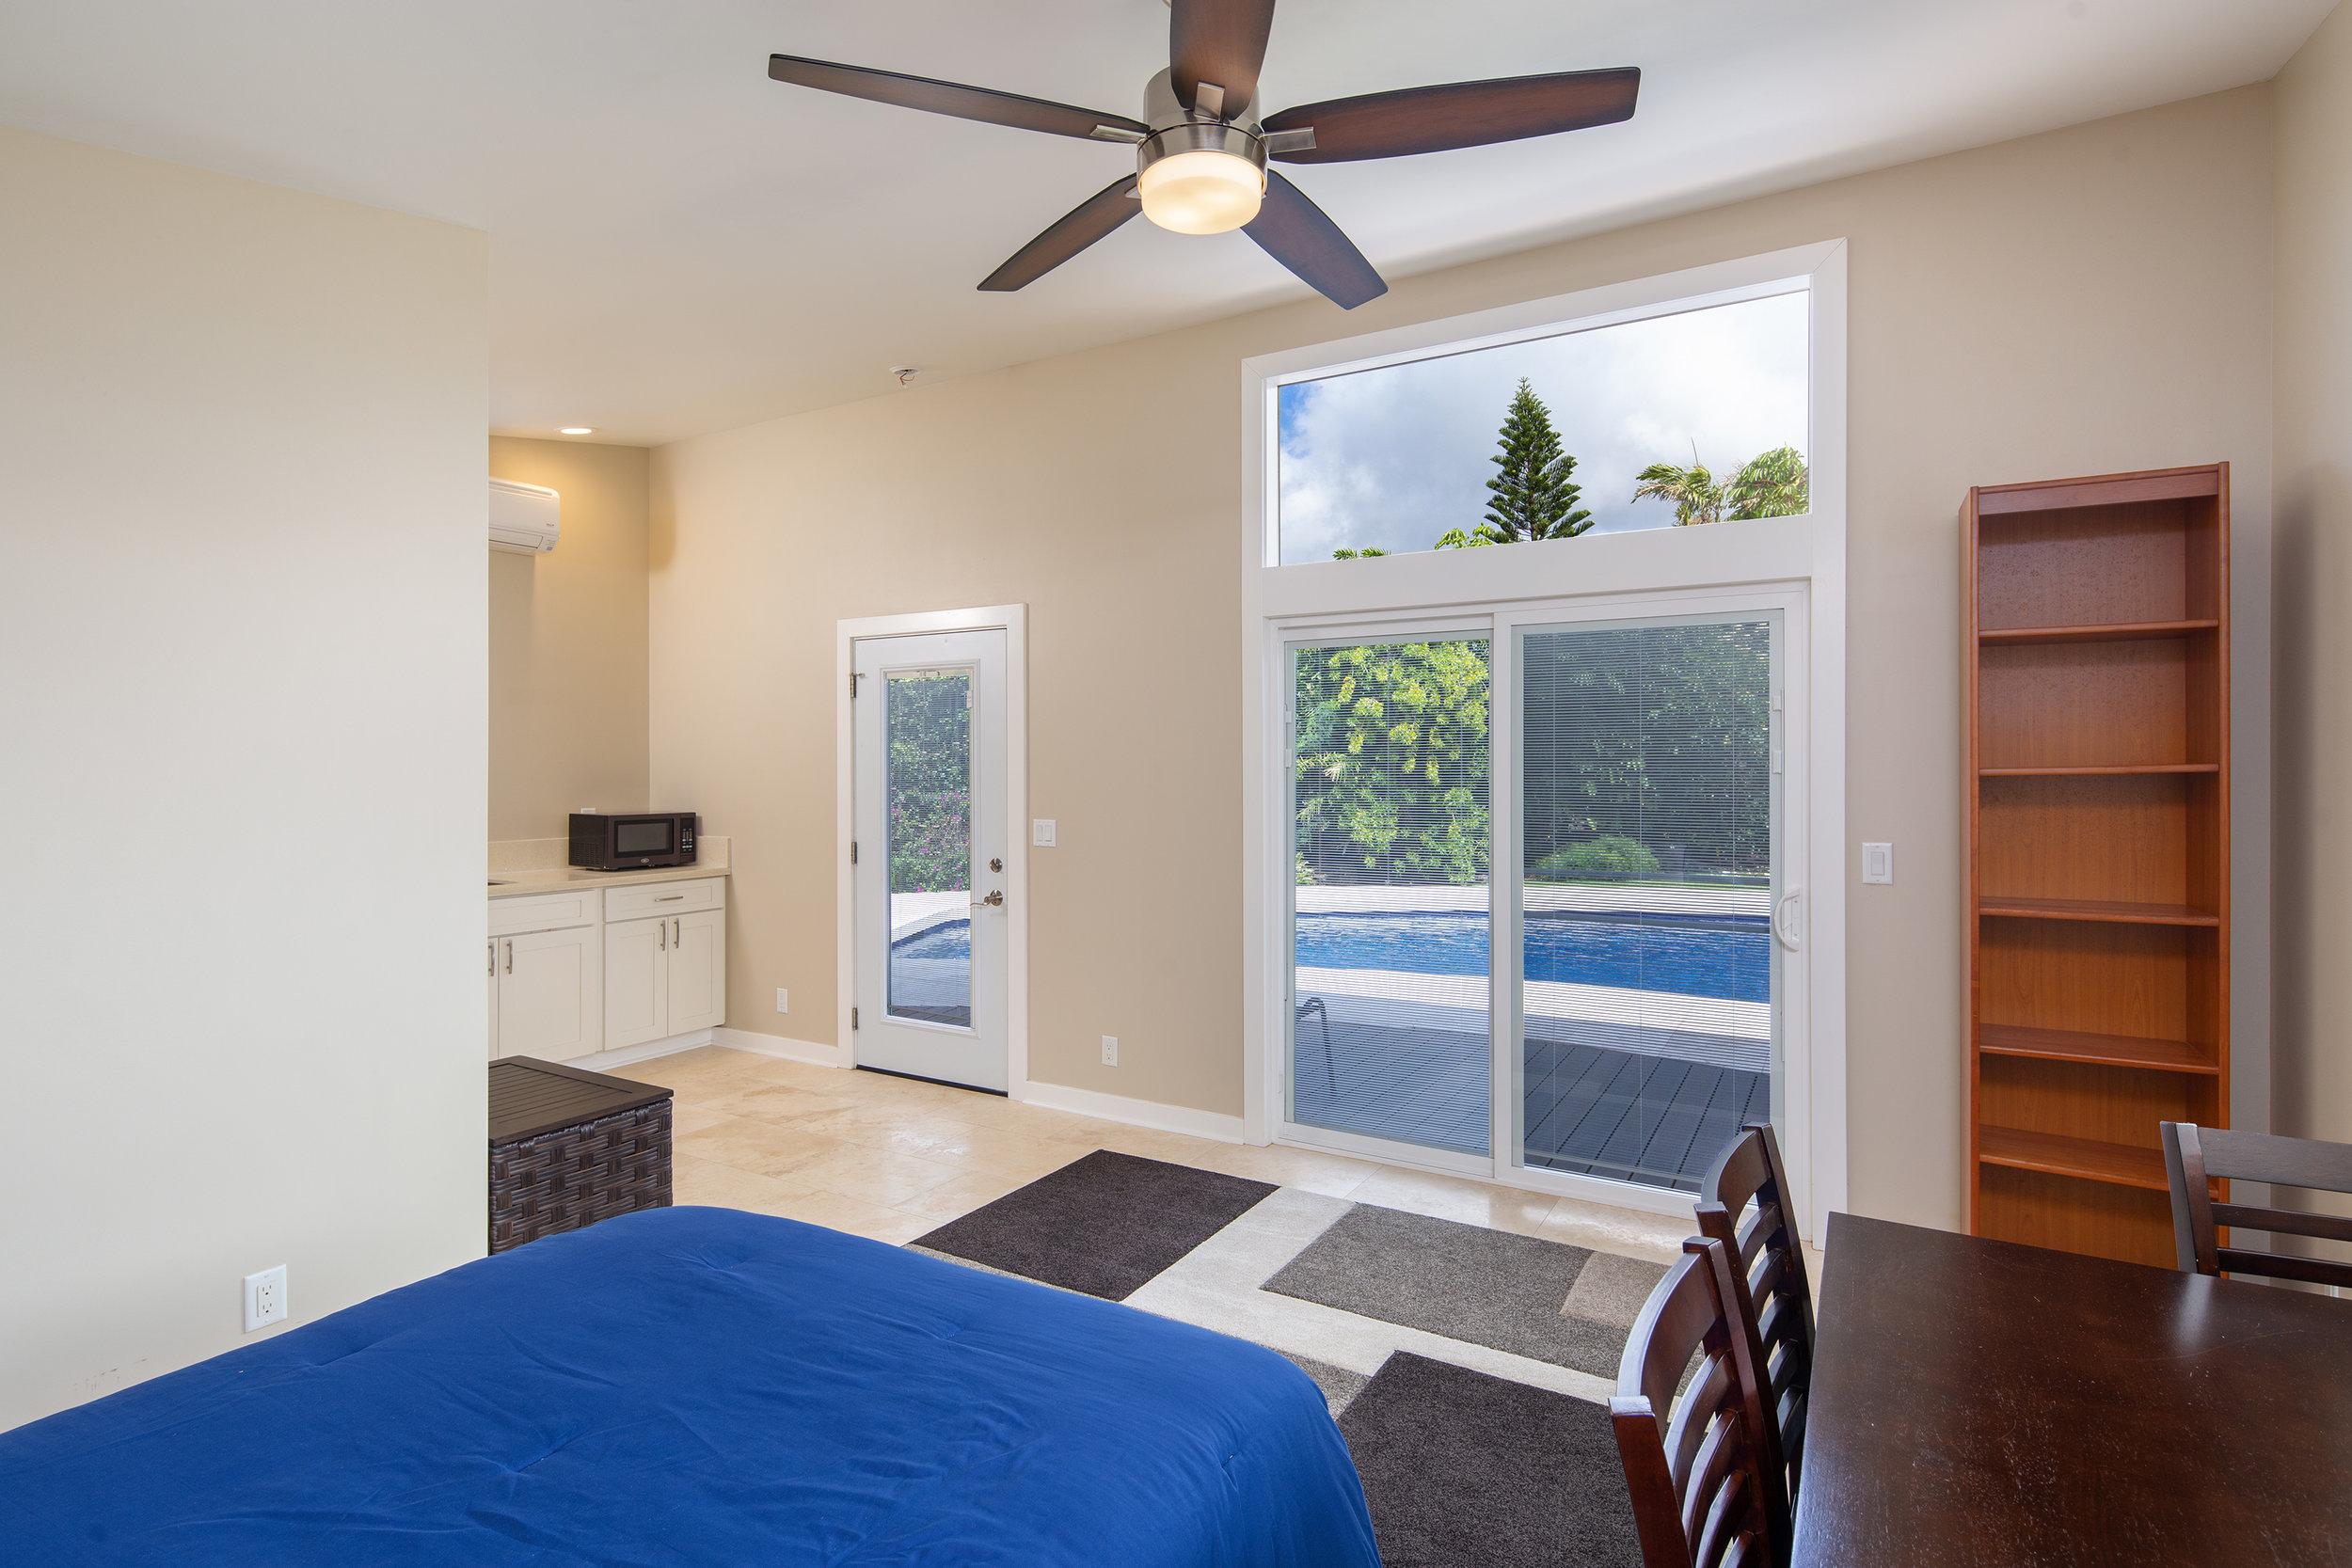 Guest house room 3.jpg